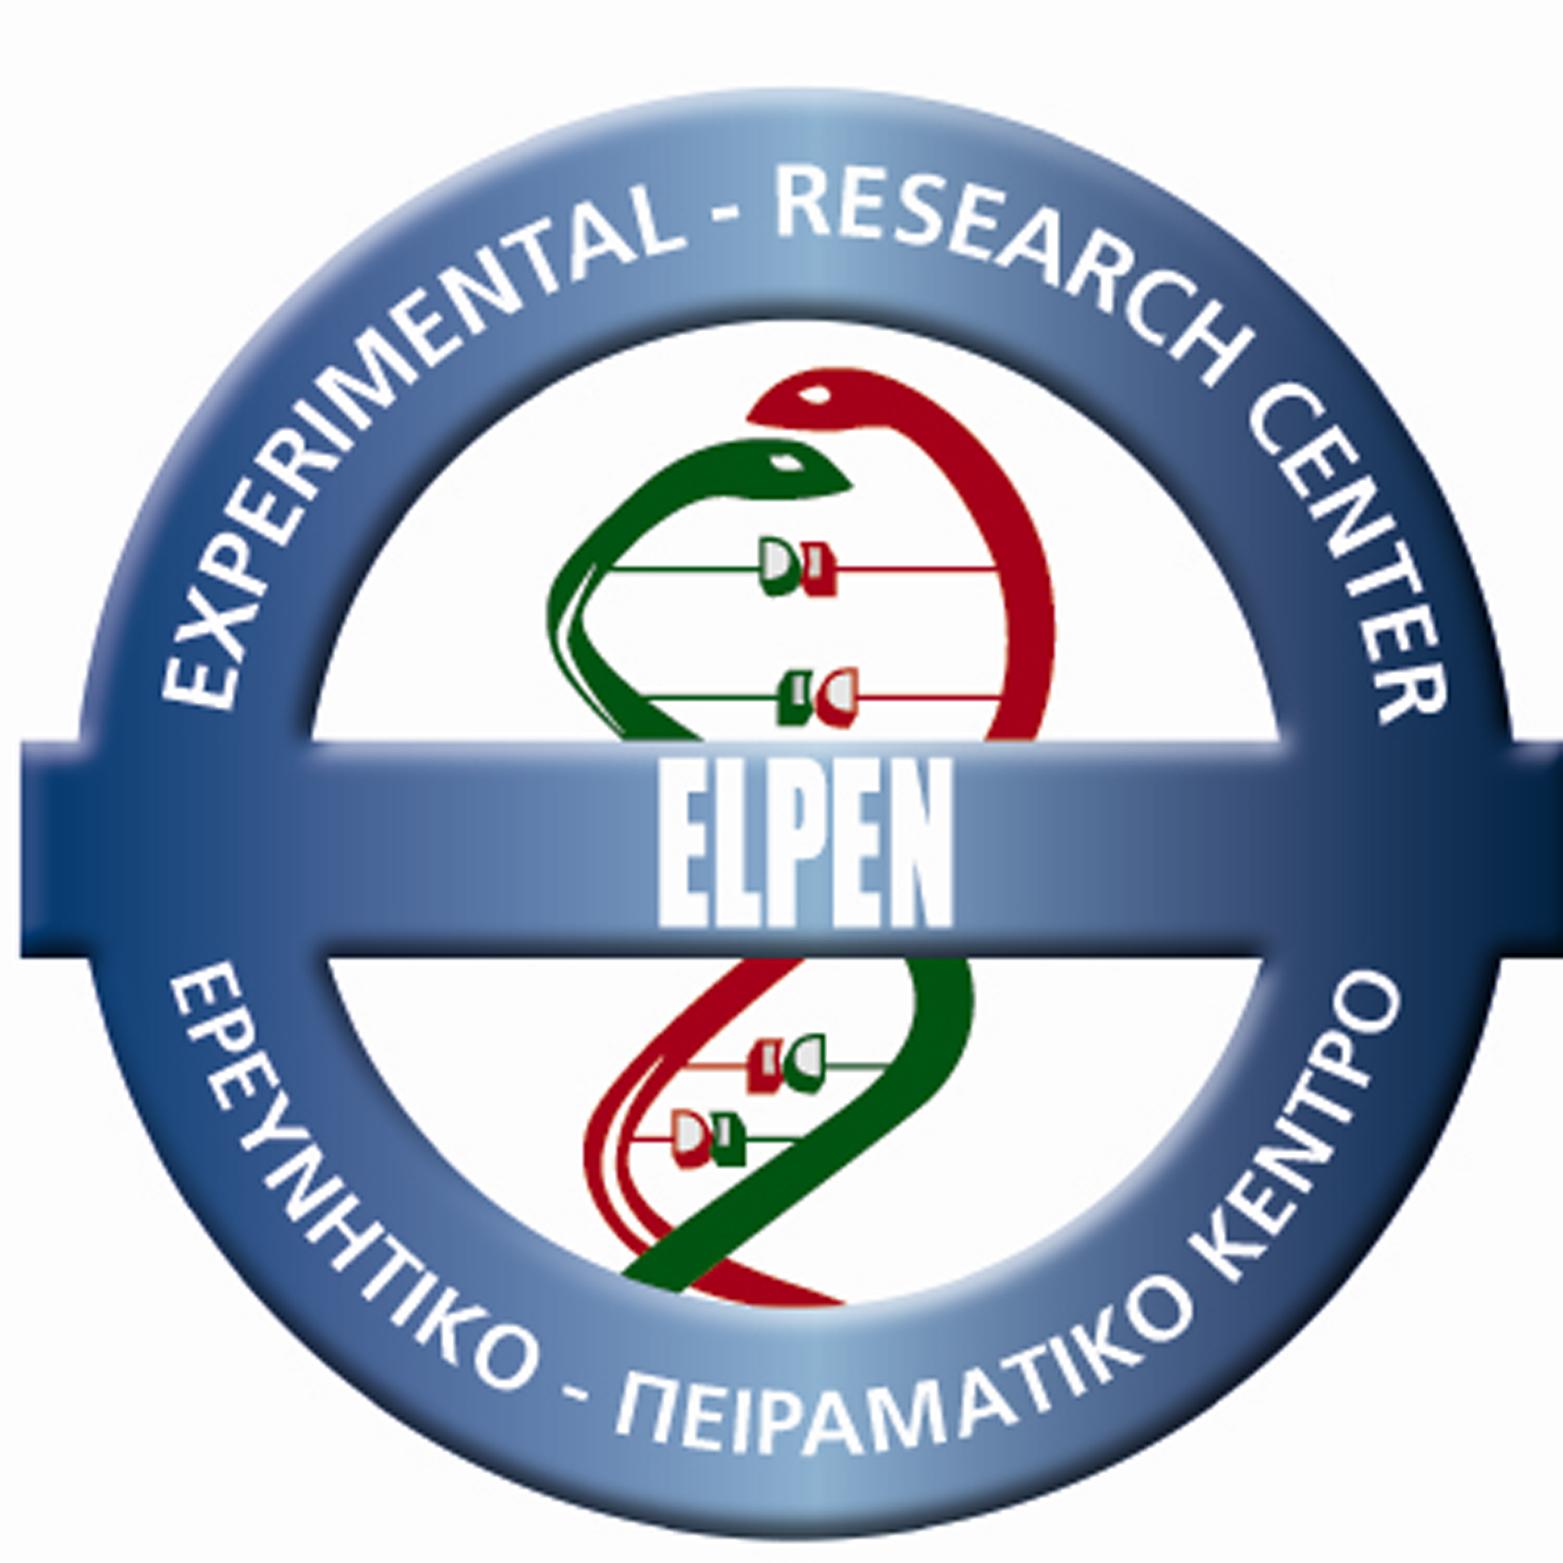 logo_researchcentreelpen